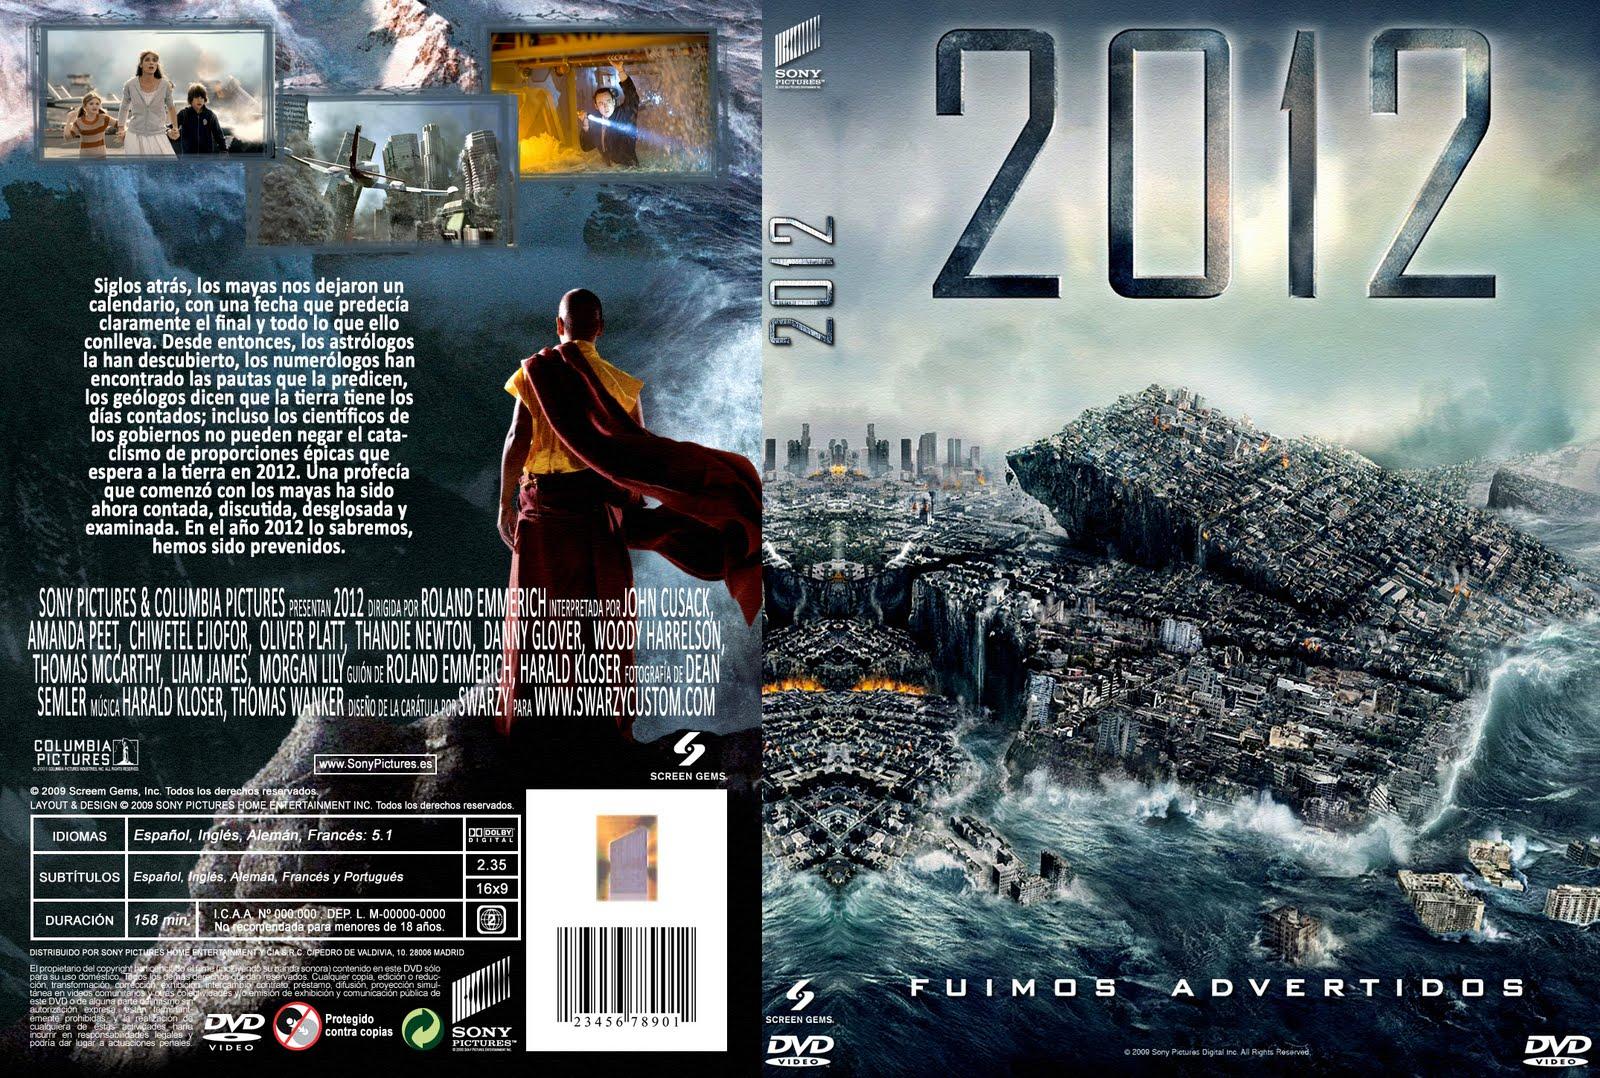 Caratula De 2012 Pelicula (DVD)